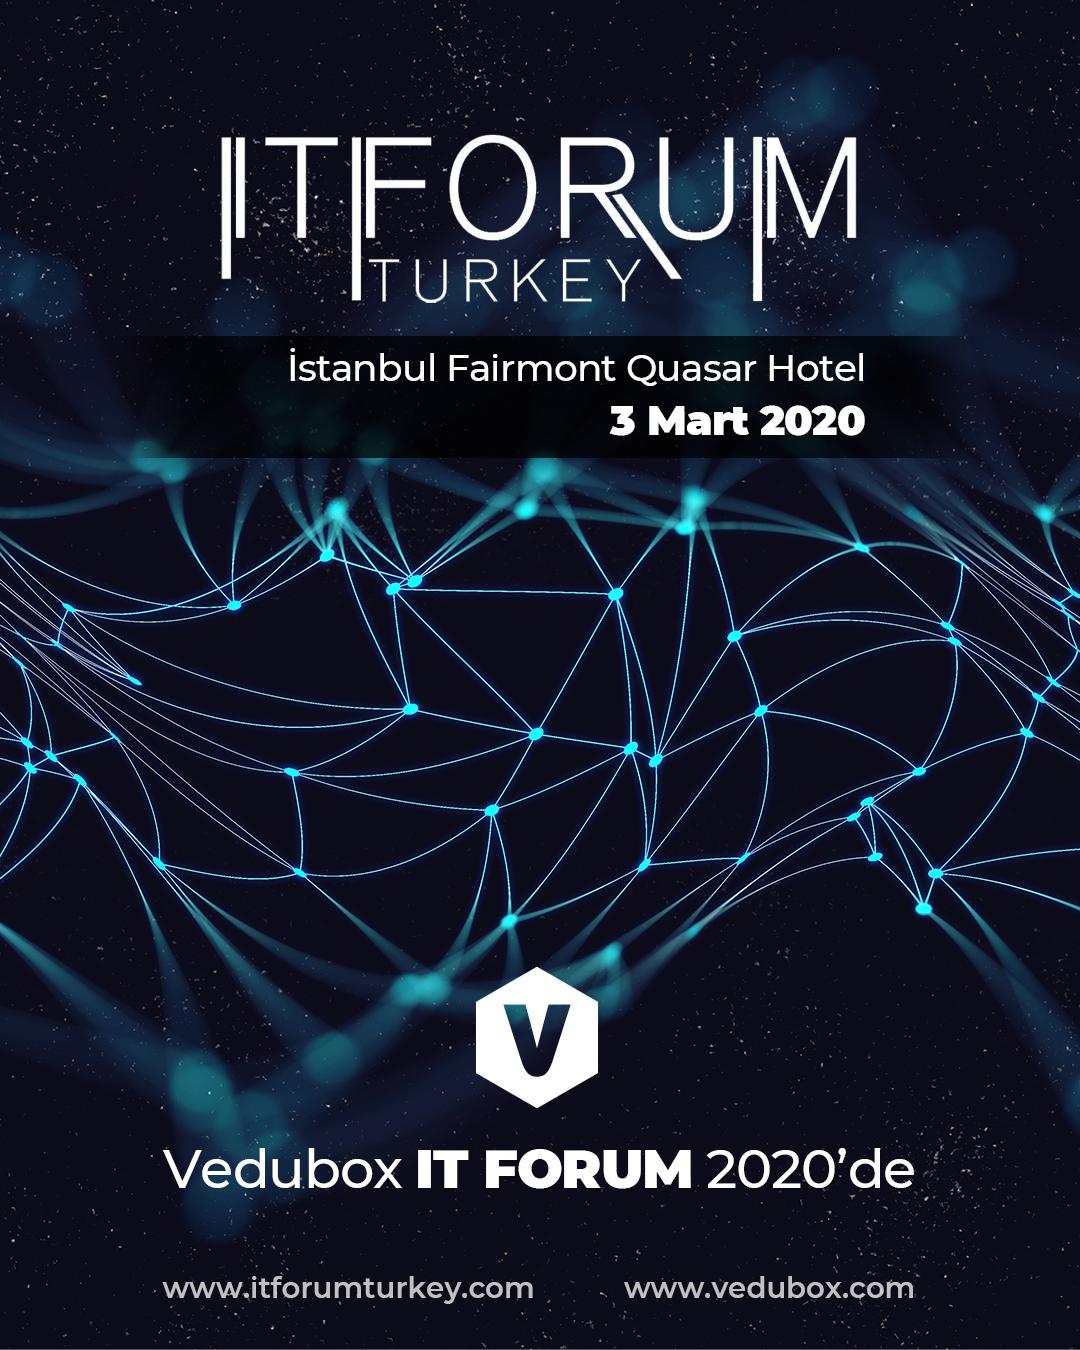 vedubox ads vertical itforum